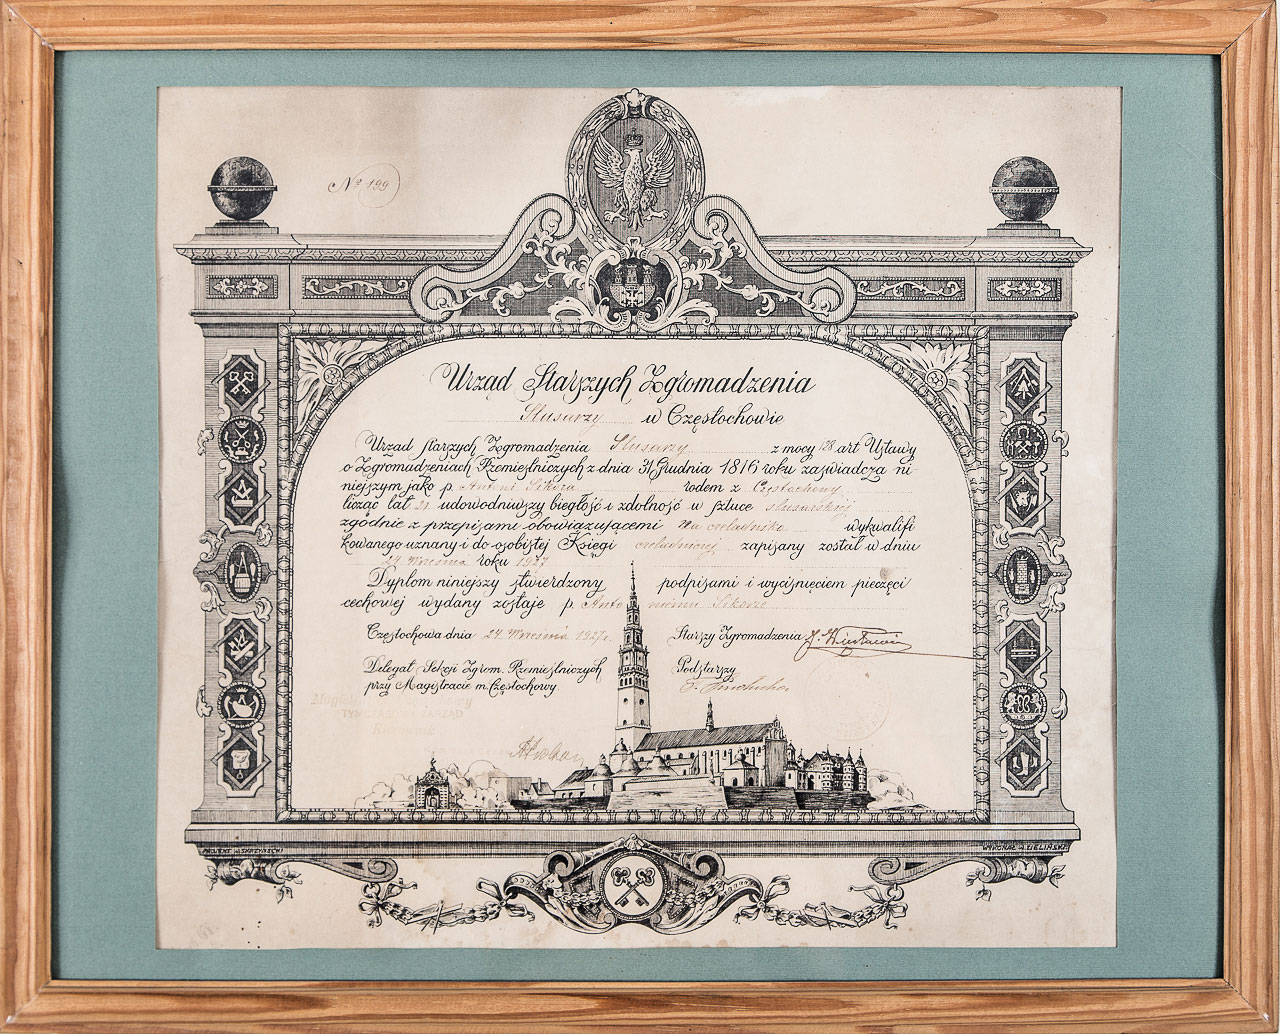 APJ Sikora Certyficate